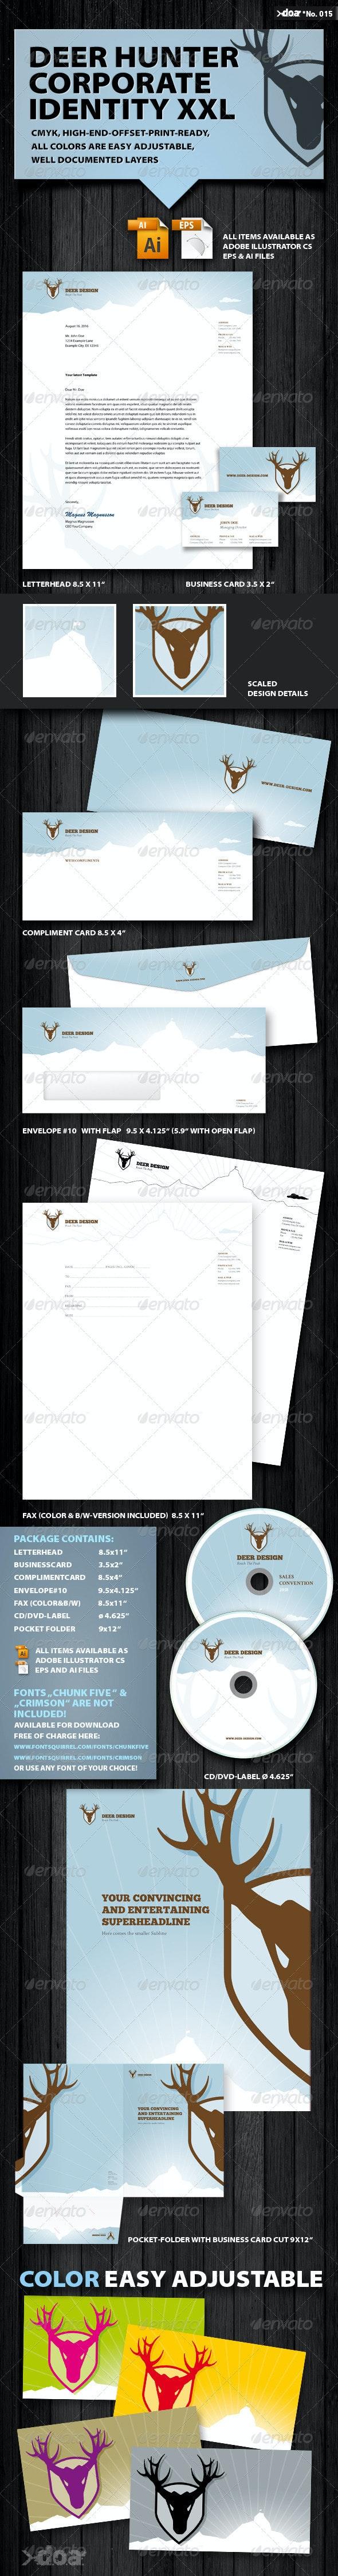 DEER HUNTER Corporate Identity XXL - Stationery Print Templates